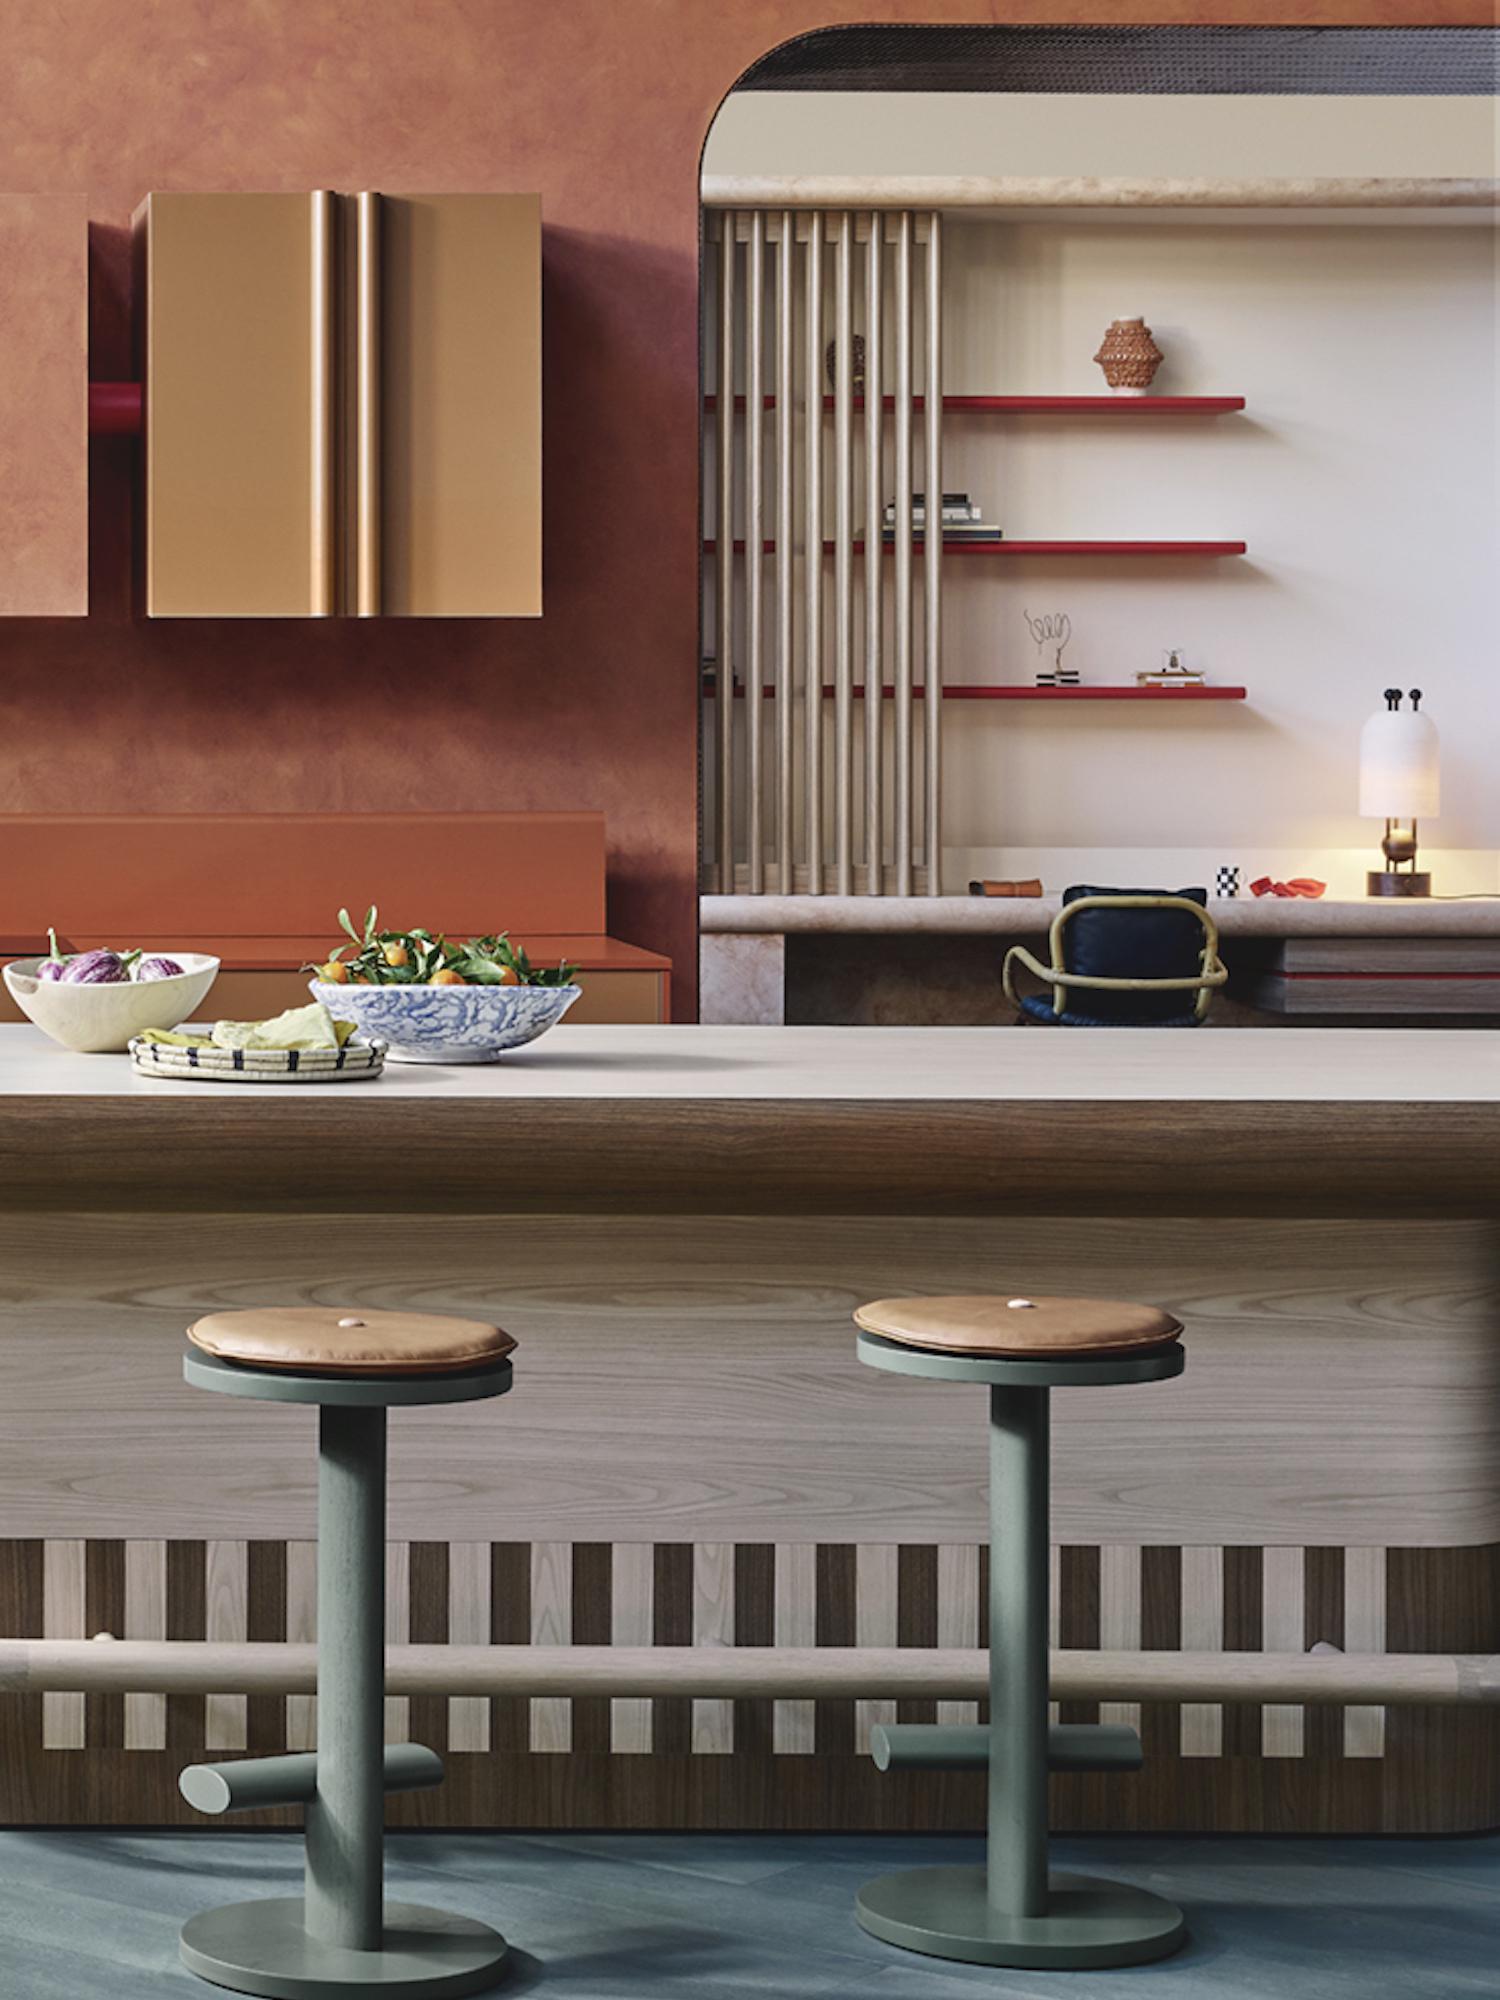 est living laminex ysg studio fantales kitchen 10 1